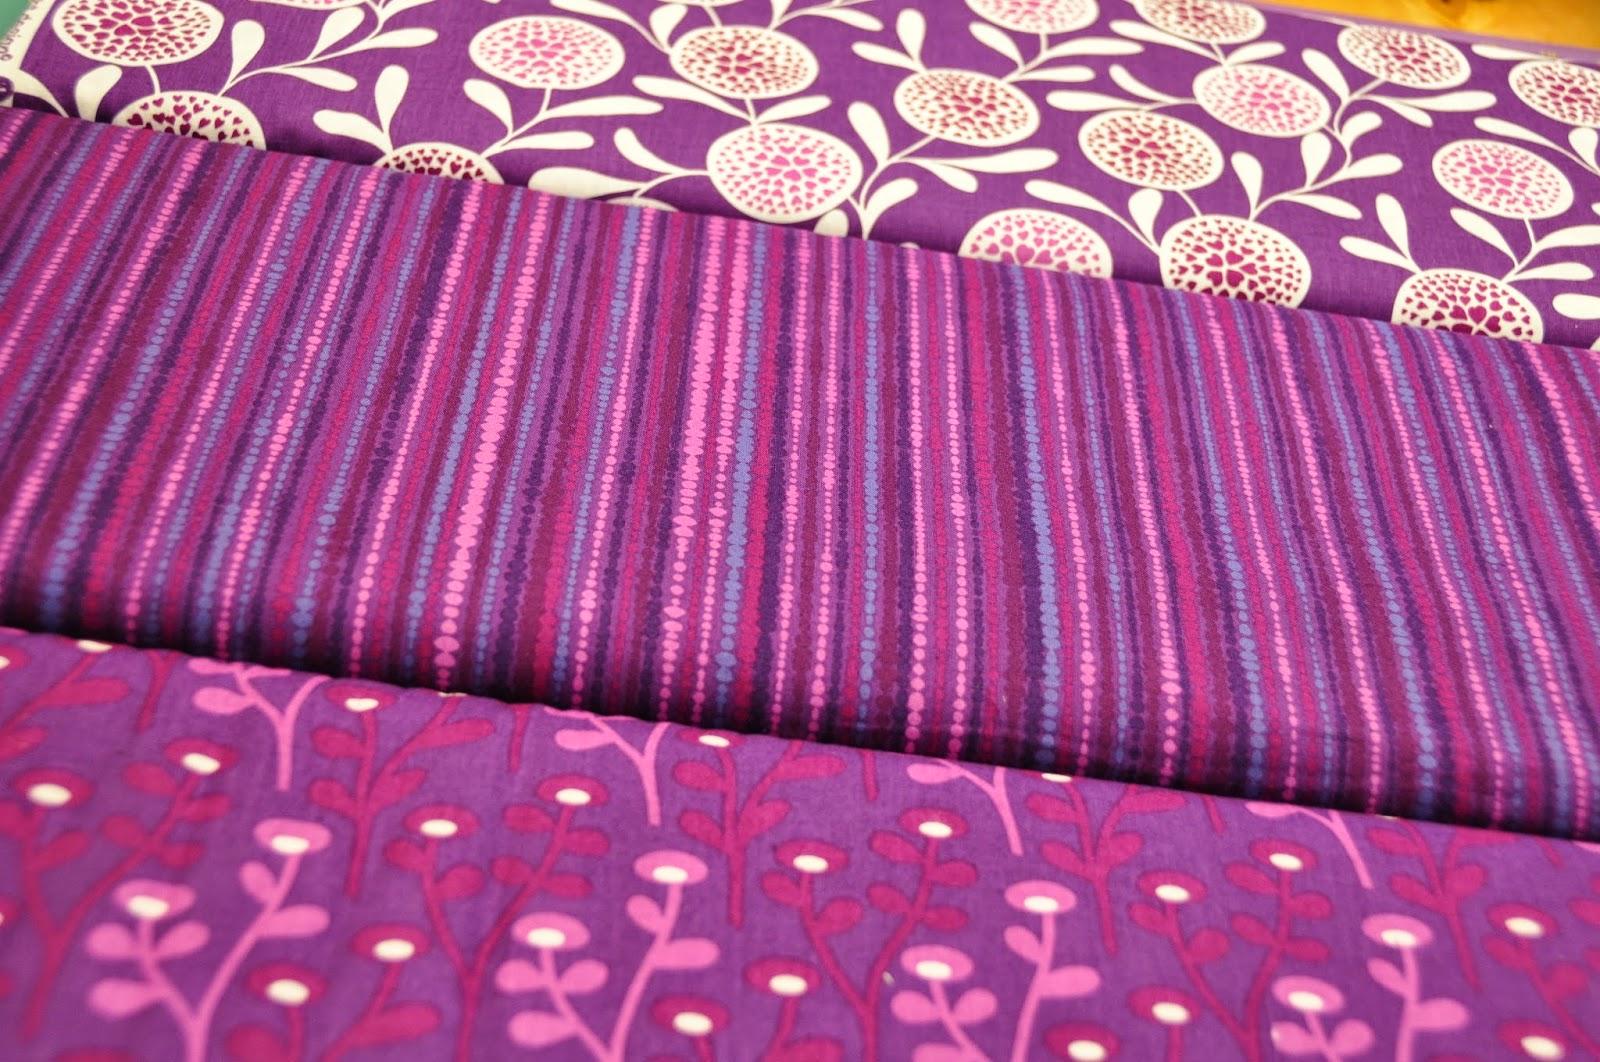 Stoffstreifen Patchwork Stoffe pink lila SAUSALITO COTTAGE von Lakehouse